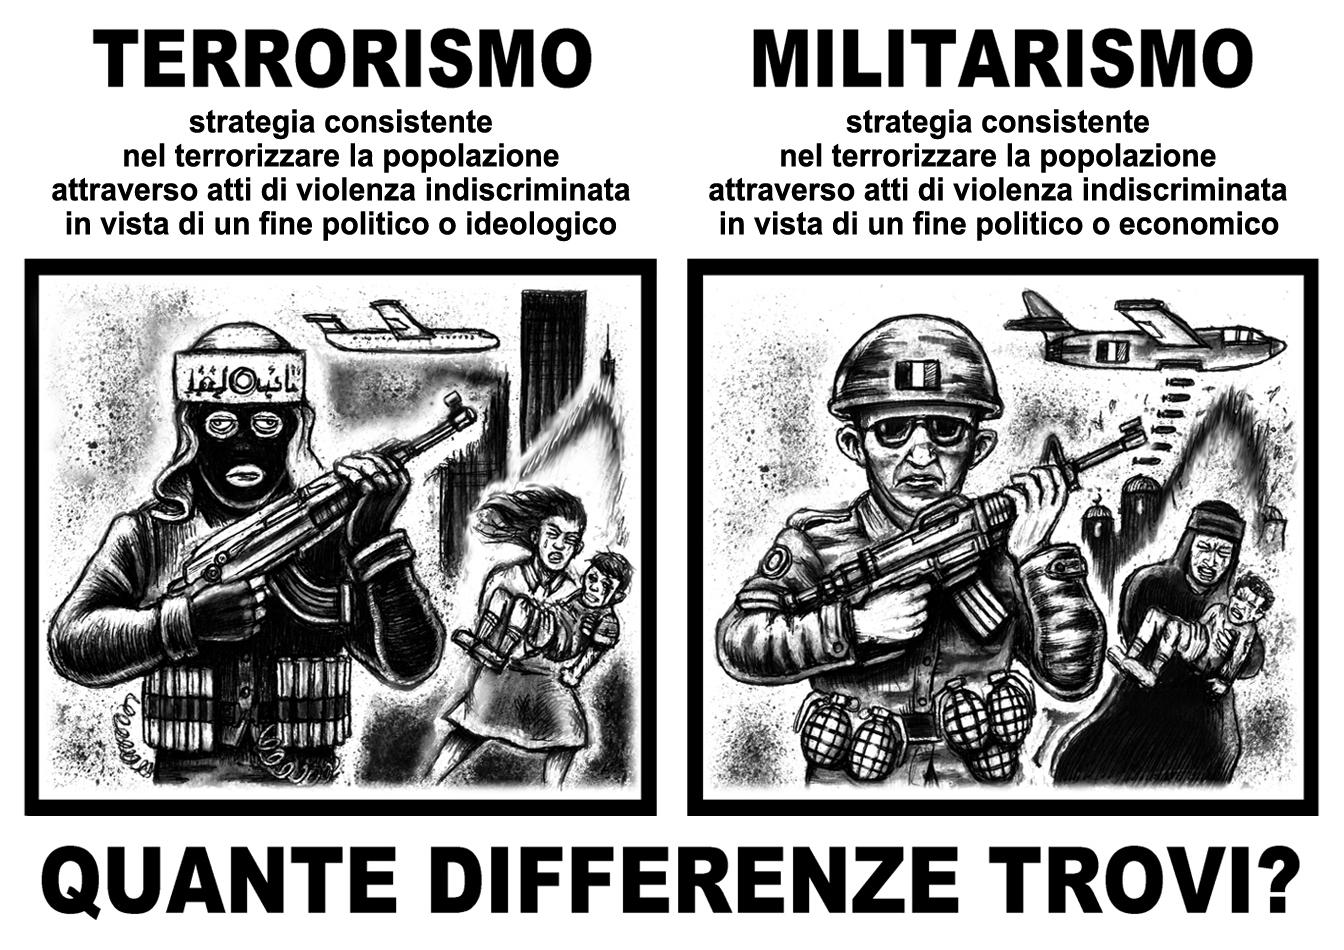 militarismo terrorismo - graficanera - NO COPYRIGHT